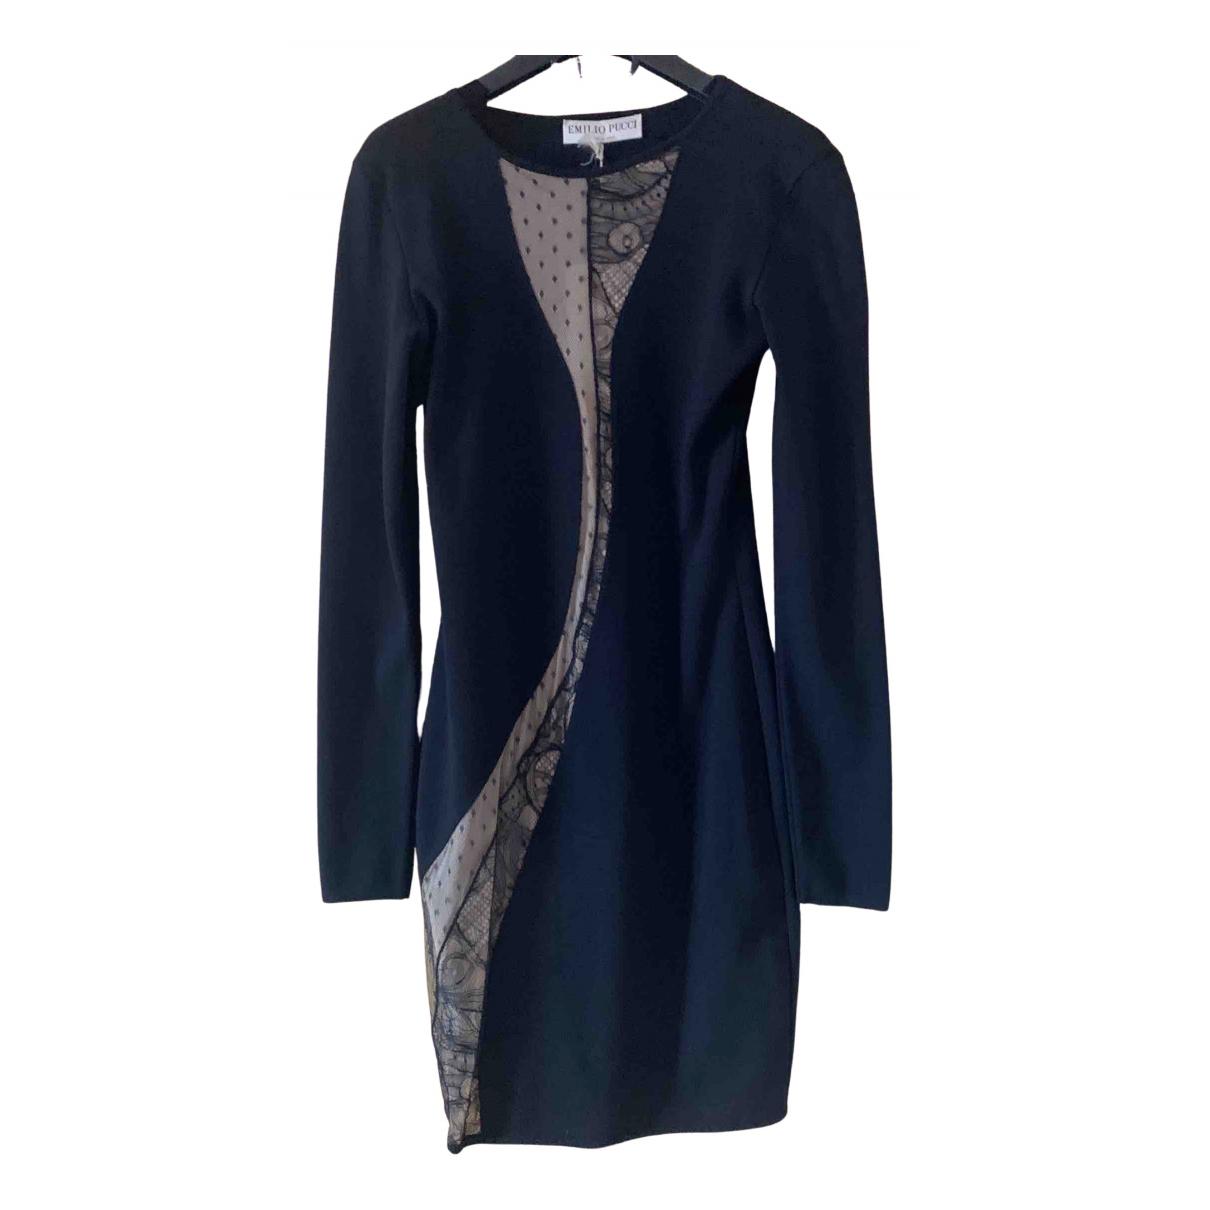 Emilio Pucci N Black Wool dress for Women S International